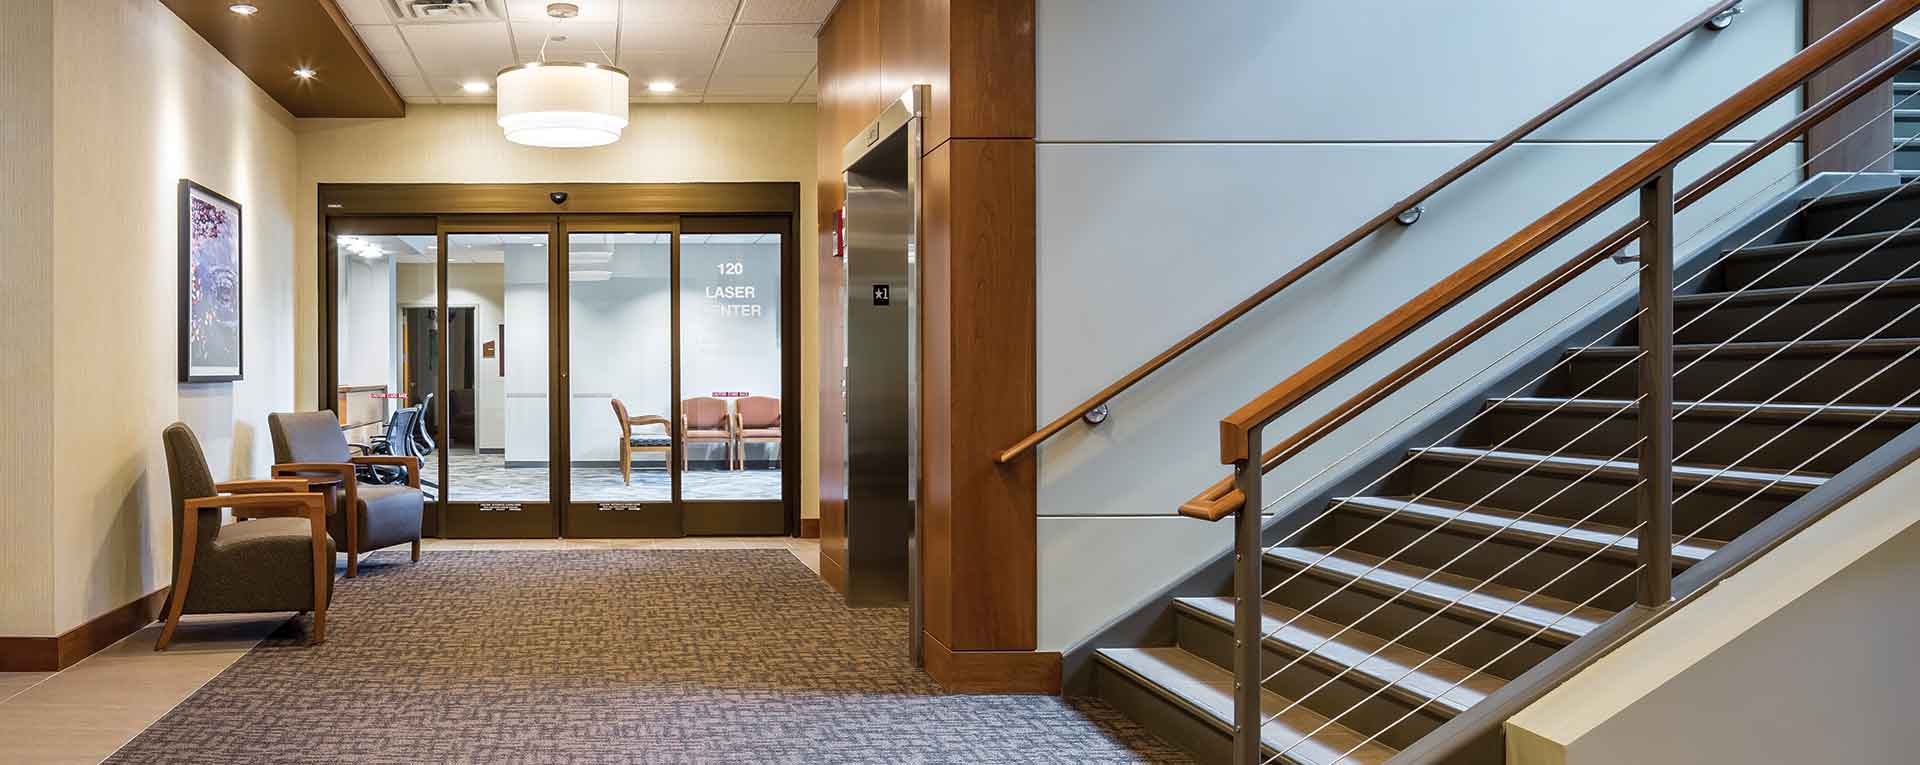 Inside Minnesota Eye Consultants Building